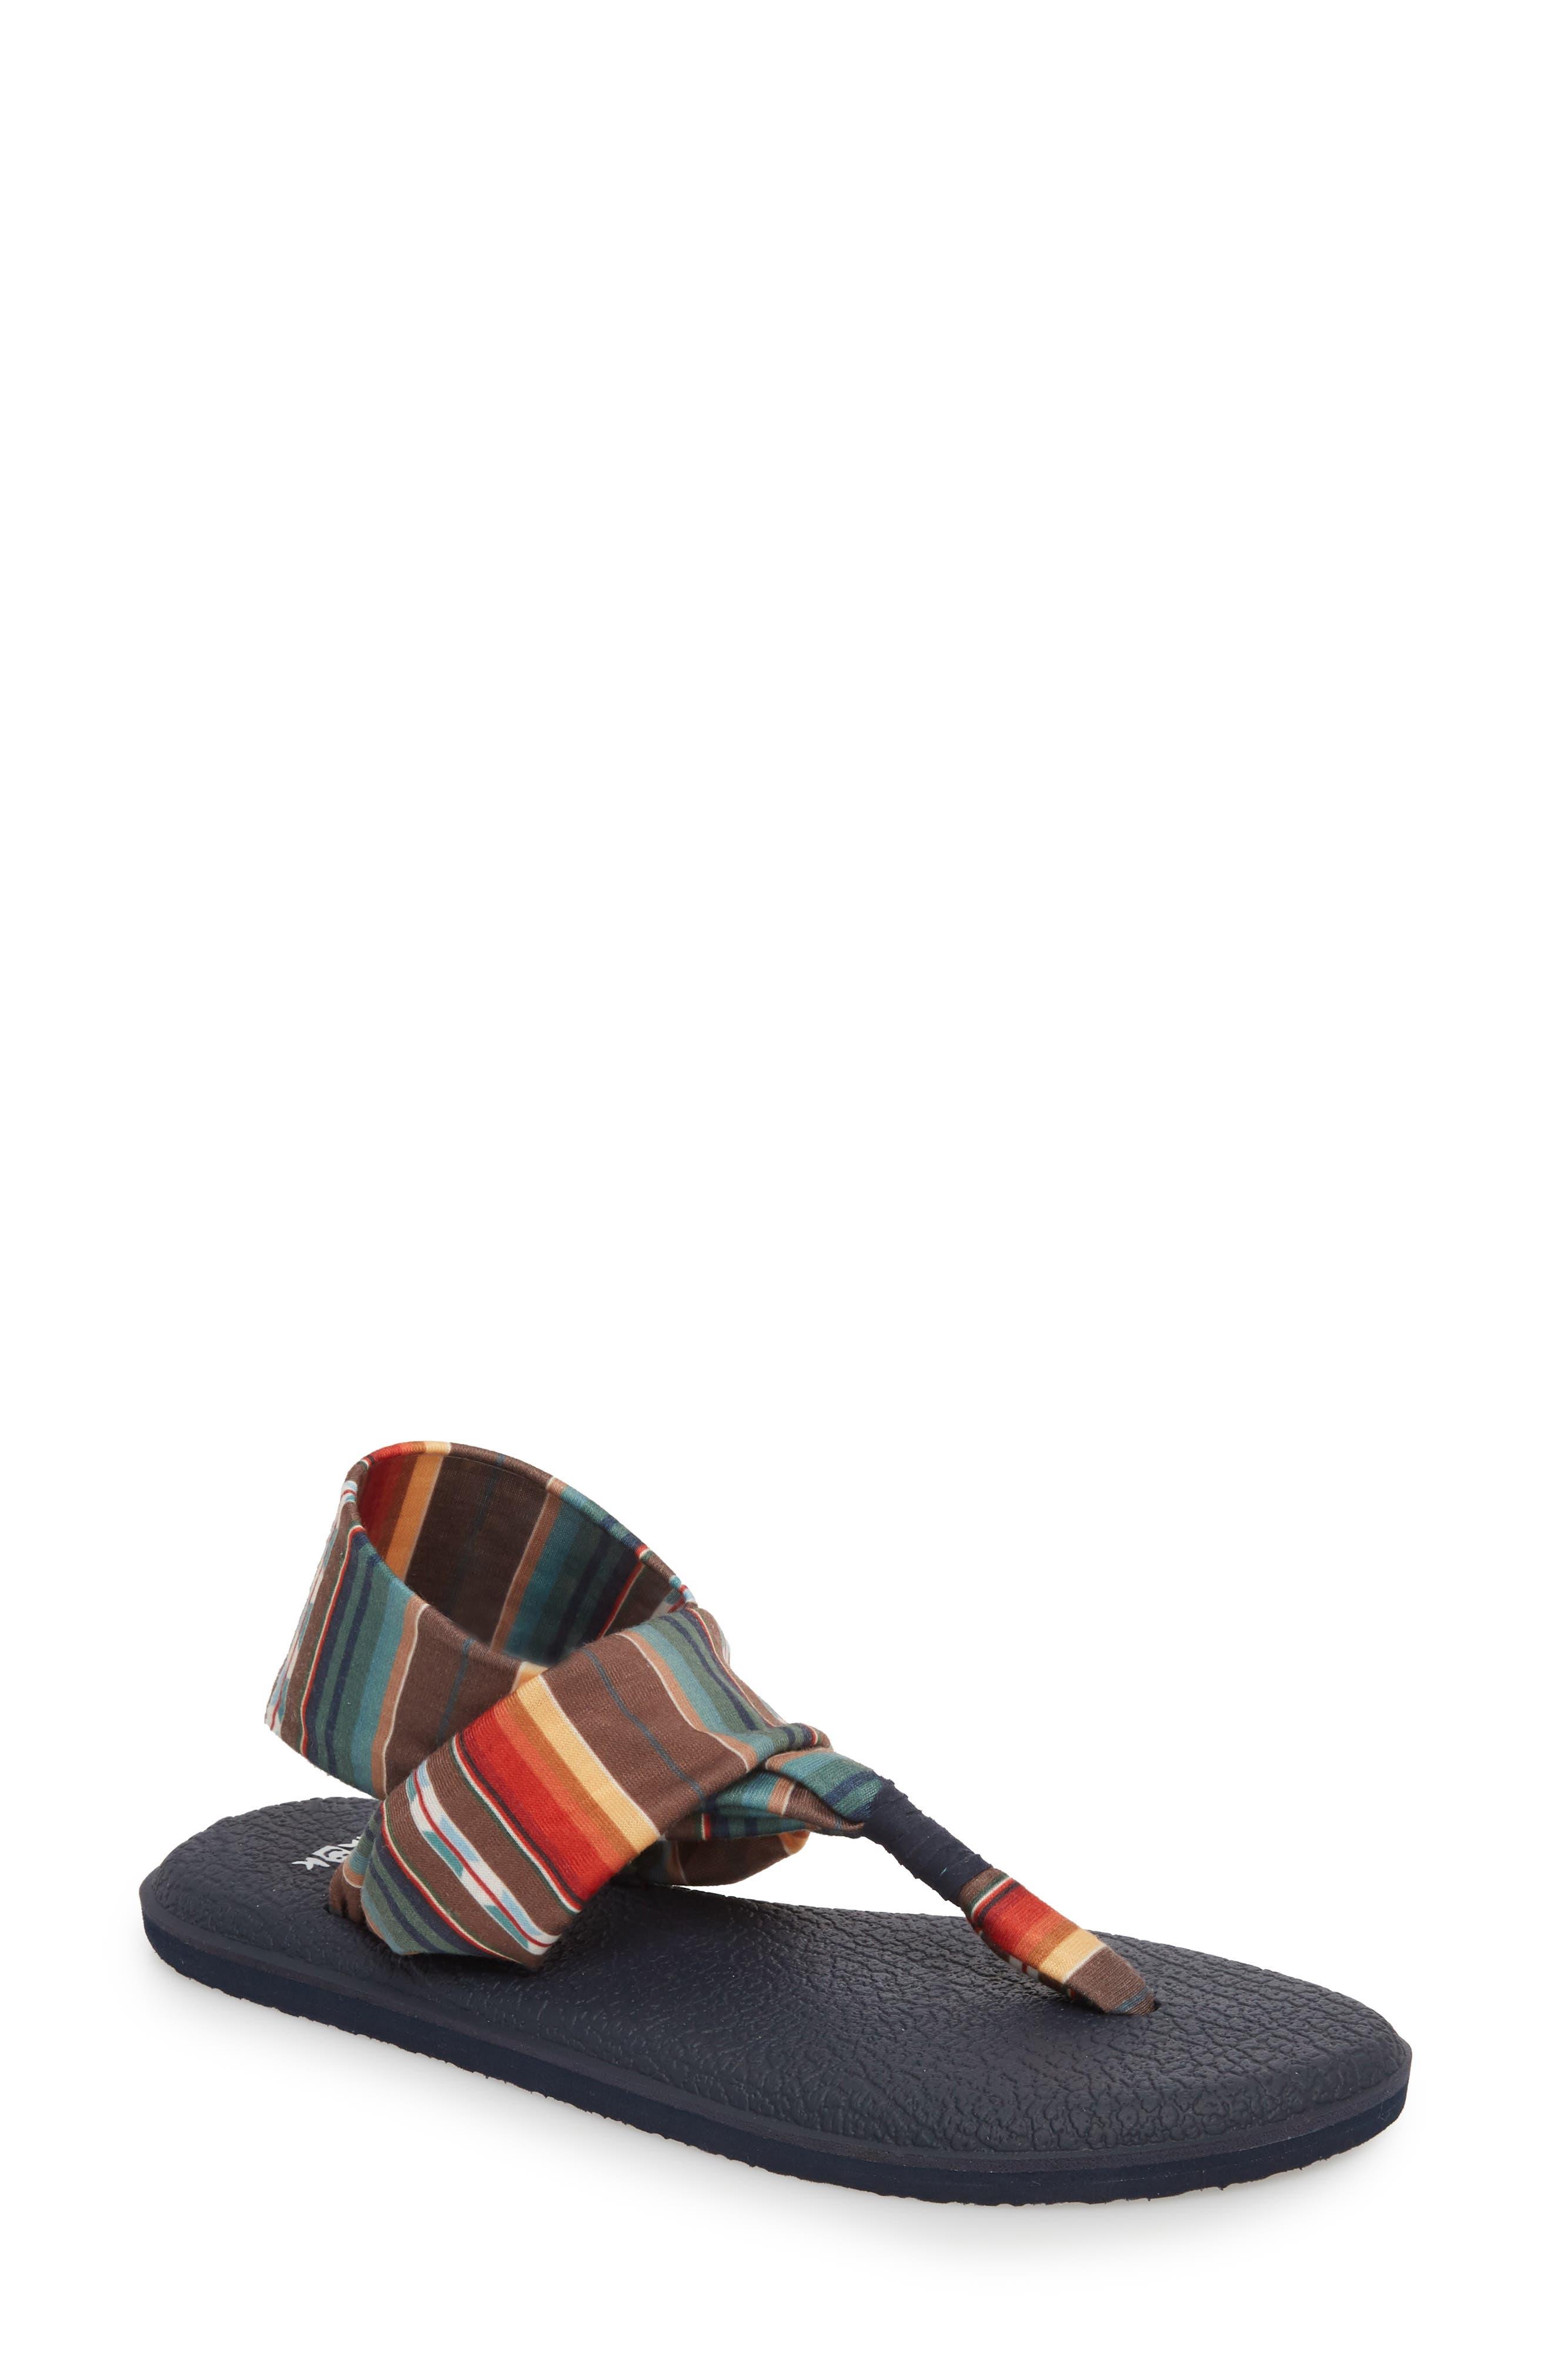 'Yoga Sling 2' Sandal,                             Main thumbnail 2, color,